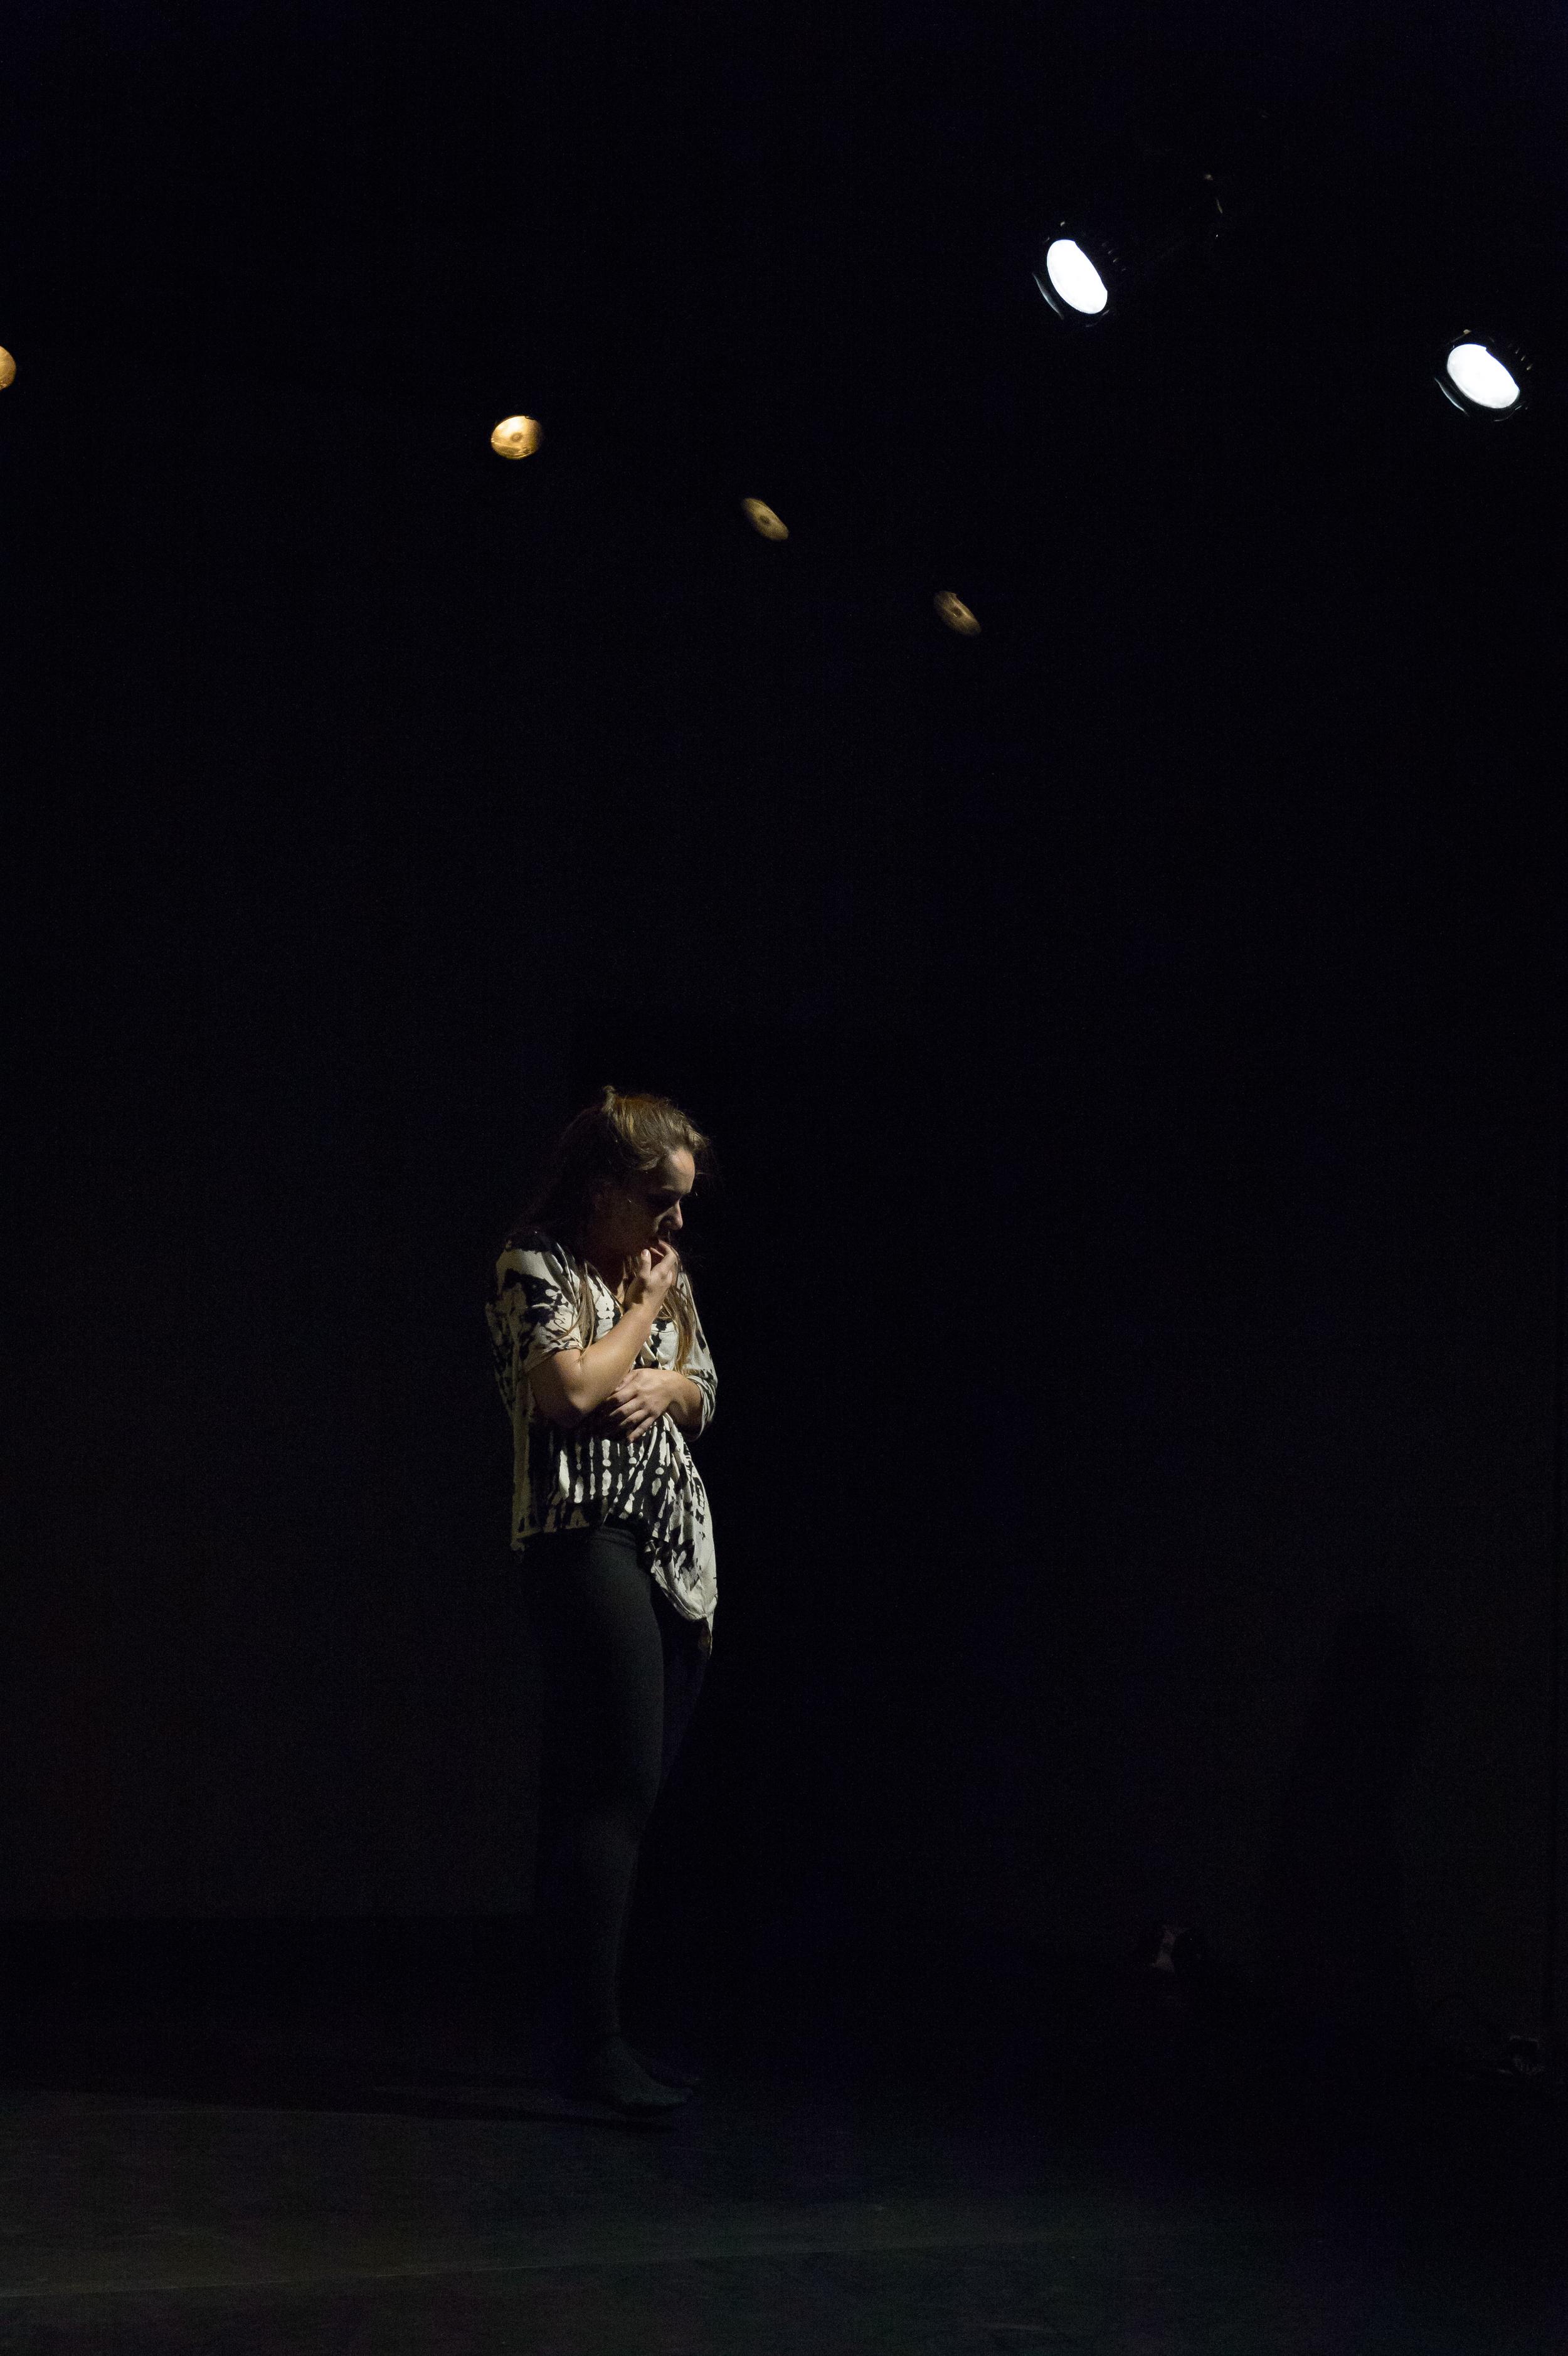 Colby Damon. August 2014. Photo: Corey Melton.